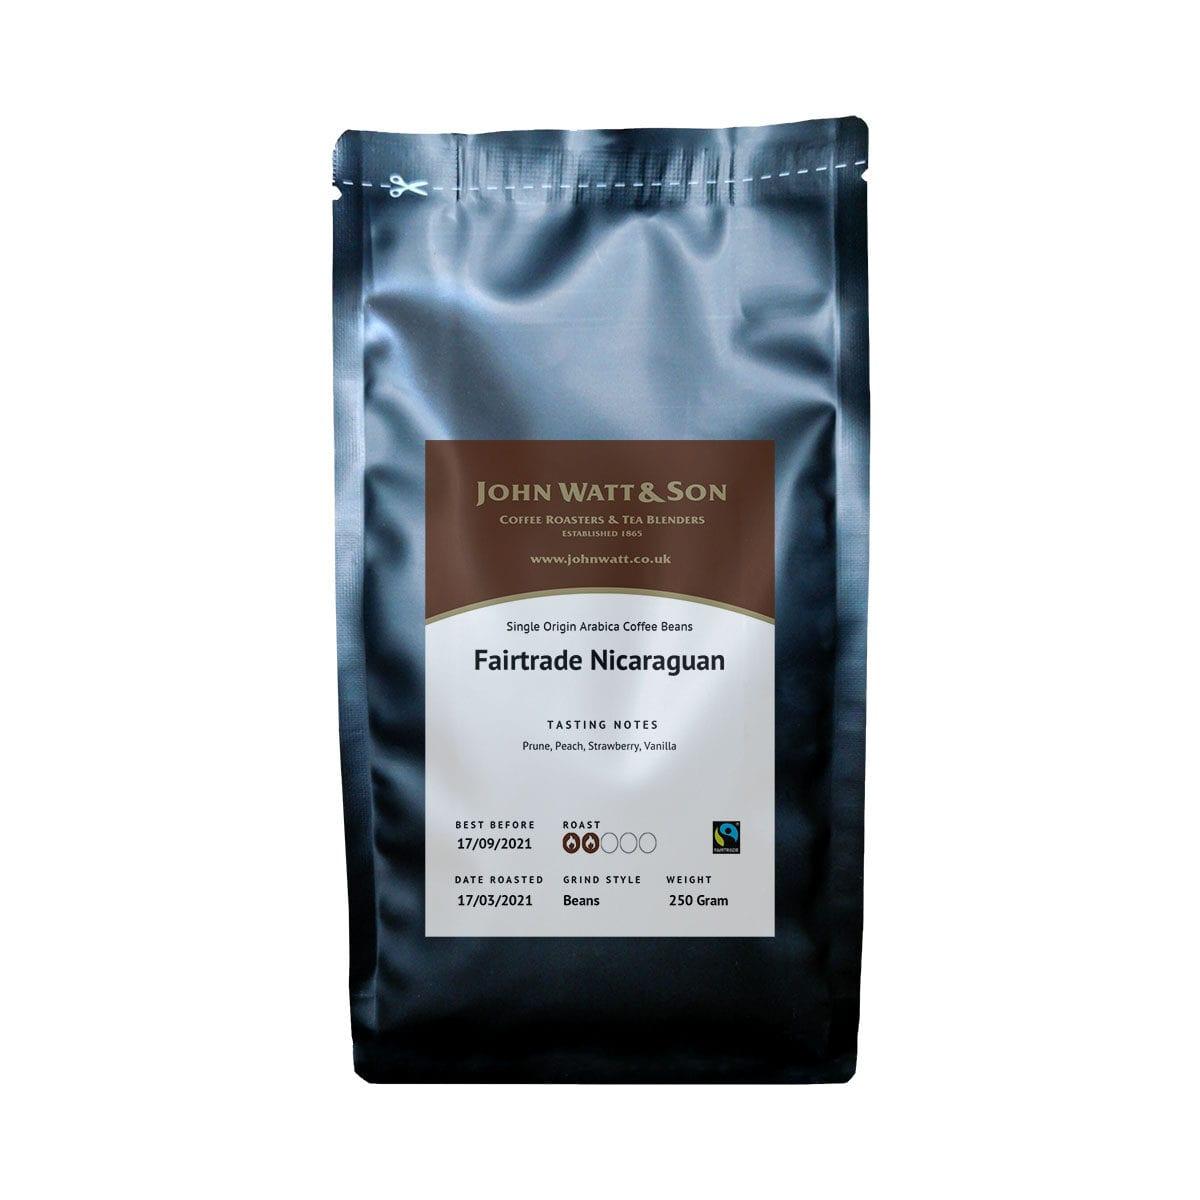 Fairtrade Nicaraguan coffee